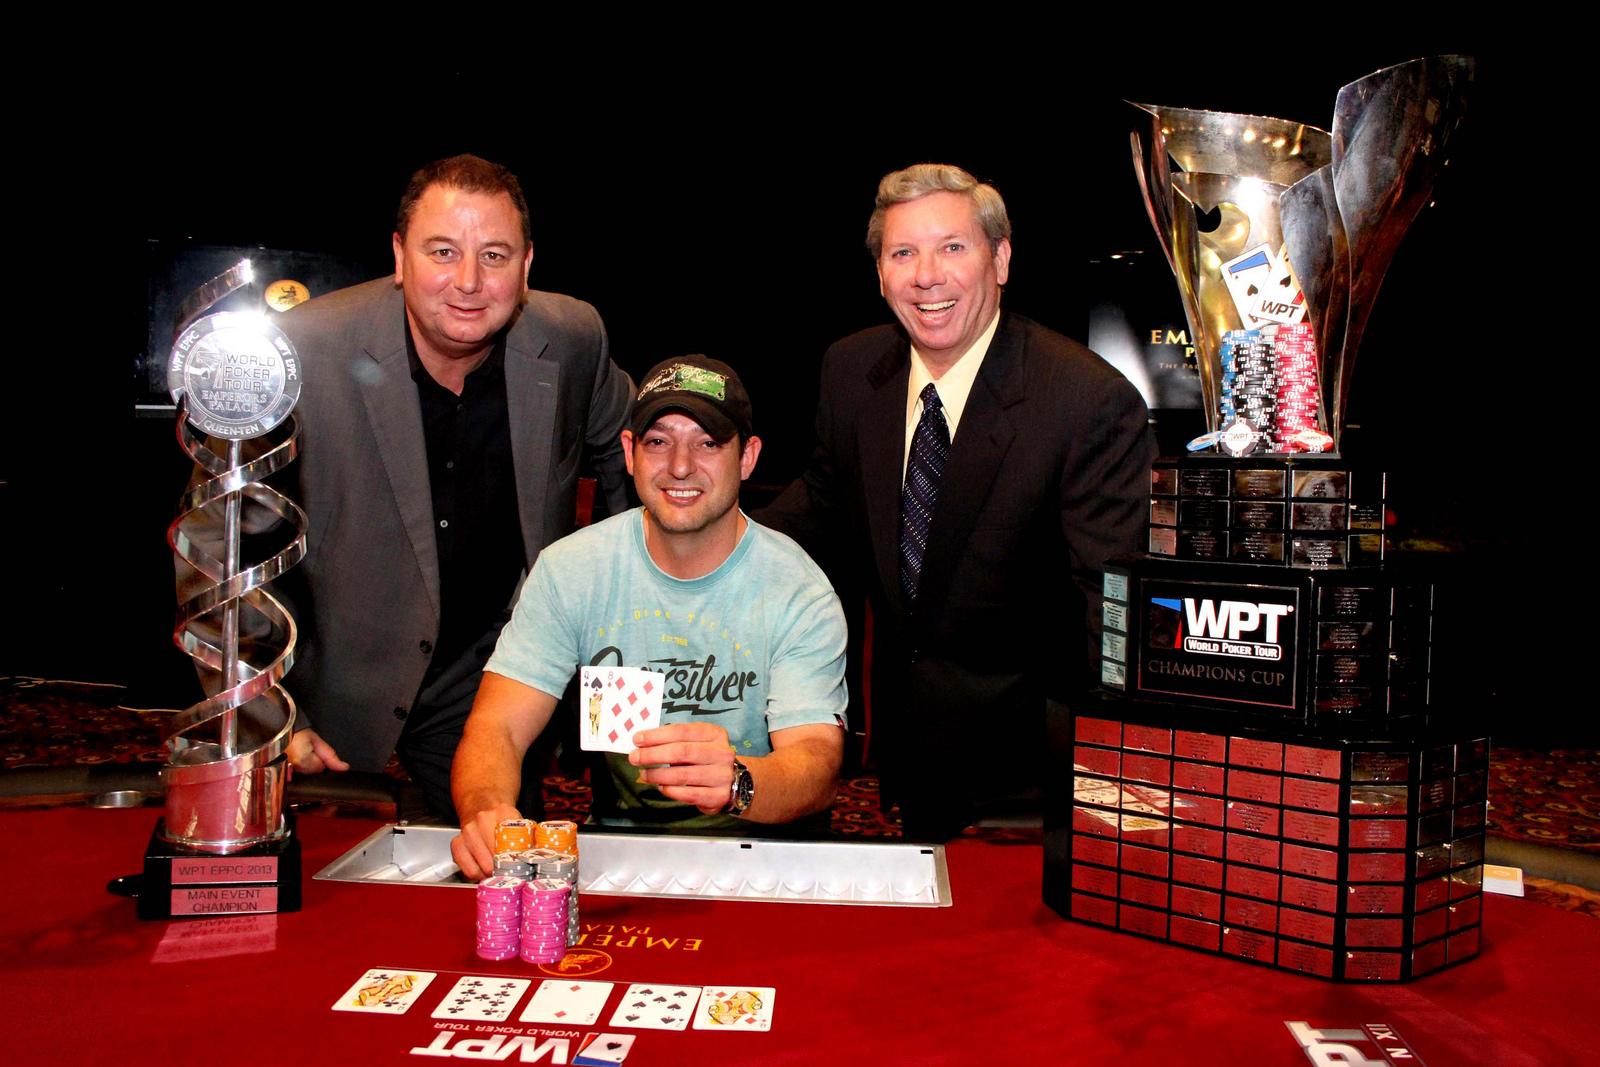 WPT Emperors Palace Poker Classic: Amateur Daniel Brits Takes The Title